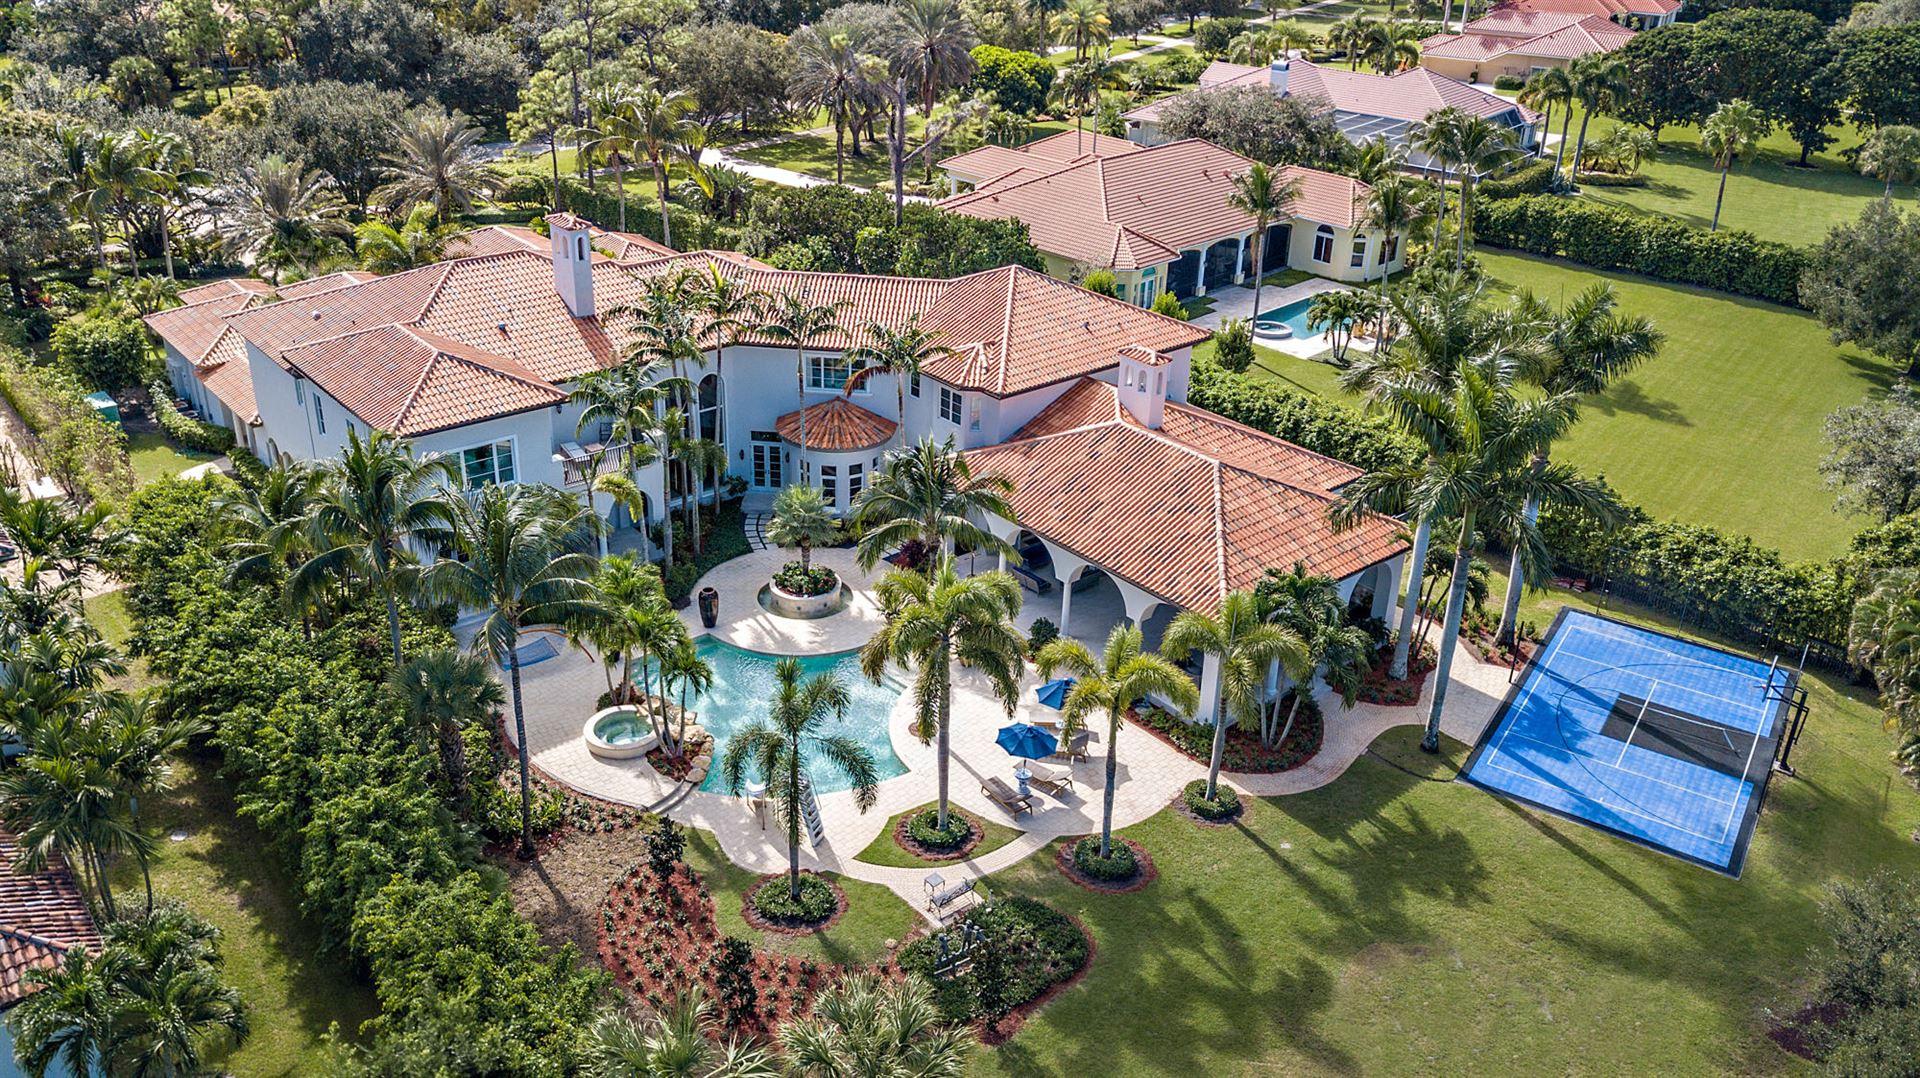 7816 Steeplechase Drive, Palm Beach Gardens, FL 33418 - #: RX-10635186